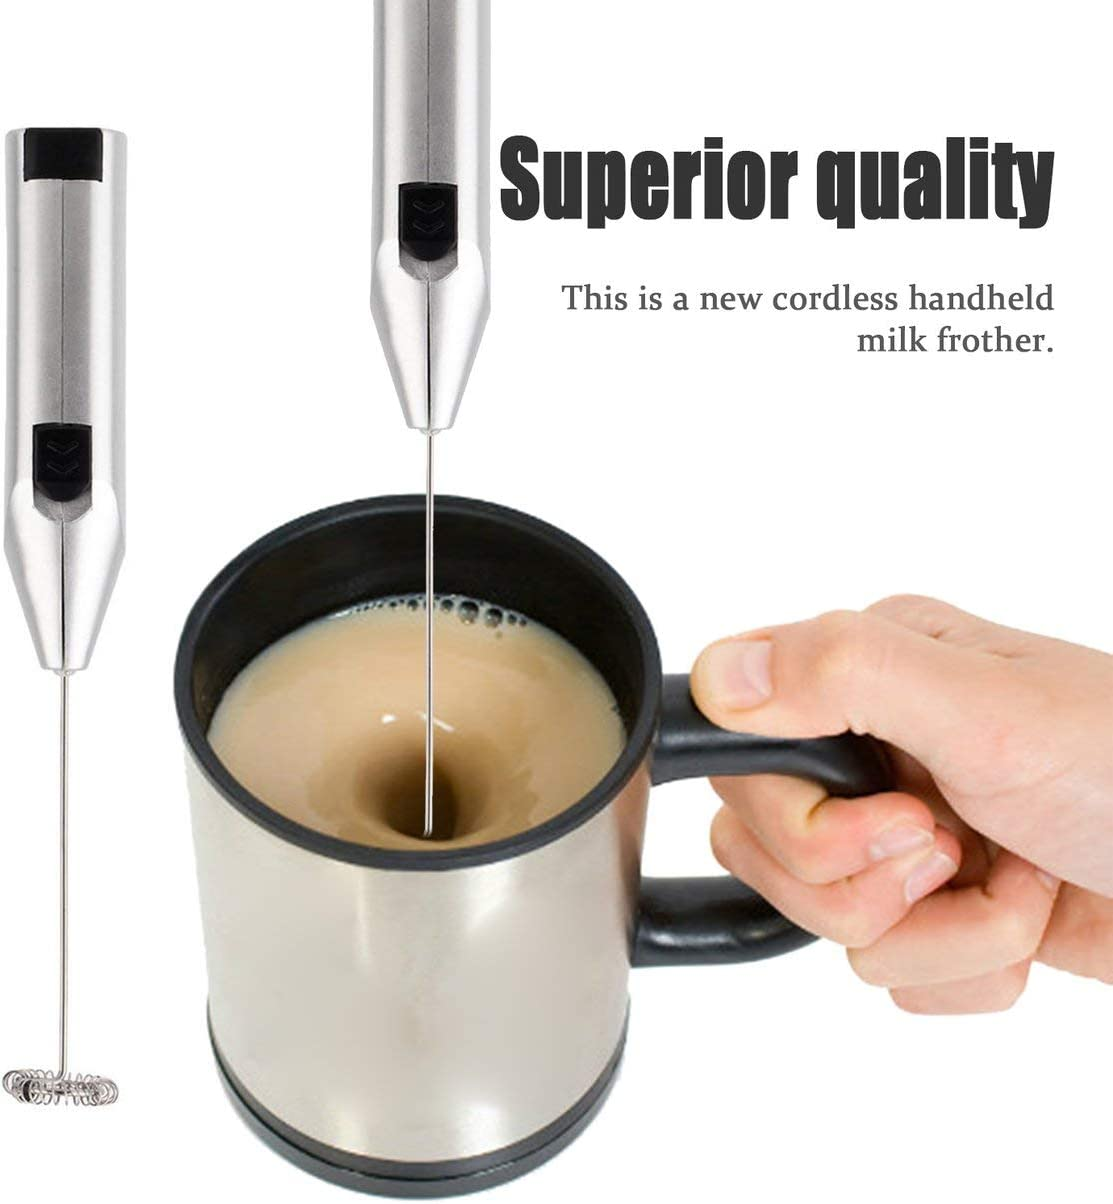 QLJ Espumador de Leche inal/ámbrico Espumador de Mano M/áquina de Capuchino Latte Espresso Chocolate Caf/é Mezclador de Cocina de Metal Handy Guard Stiring Aleatorio